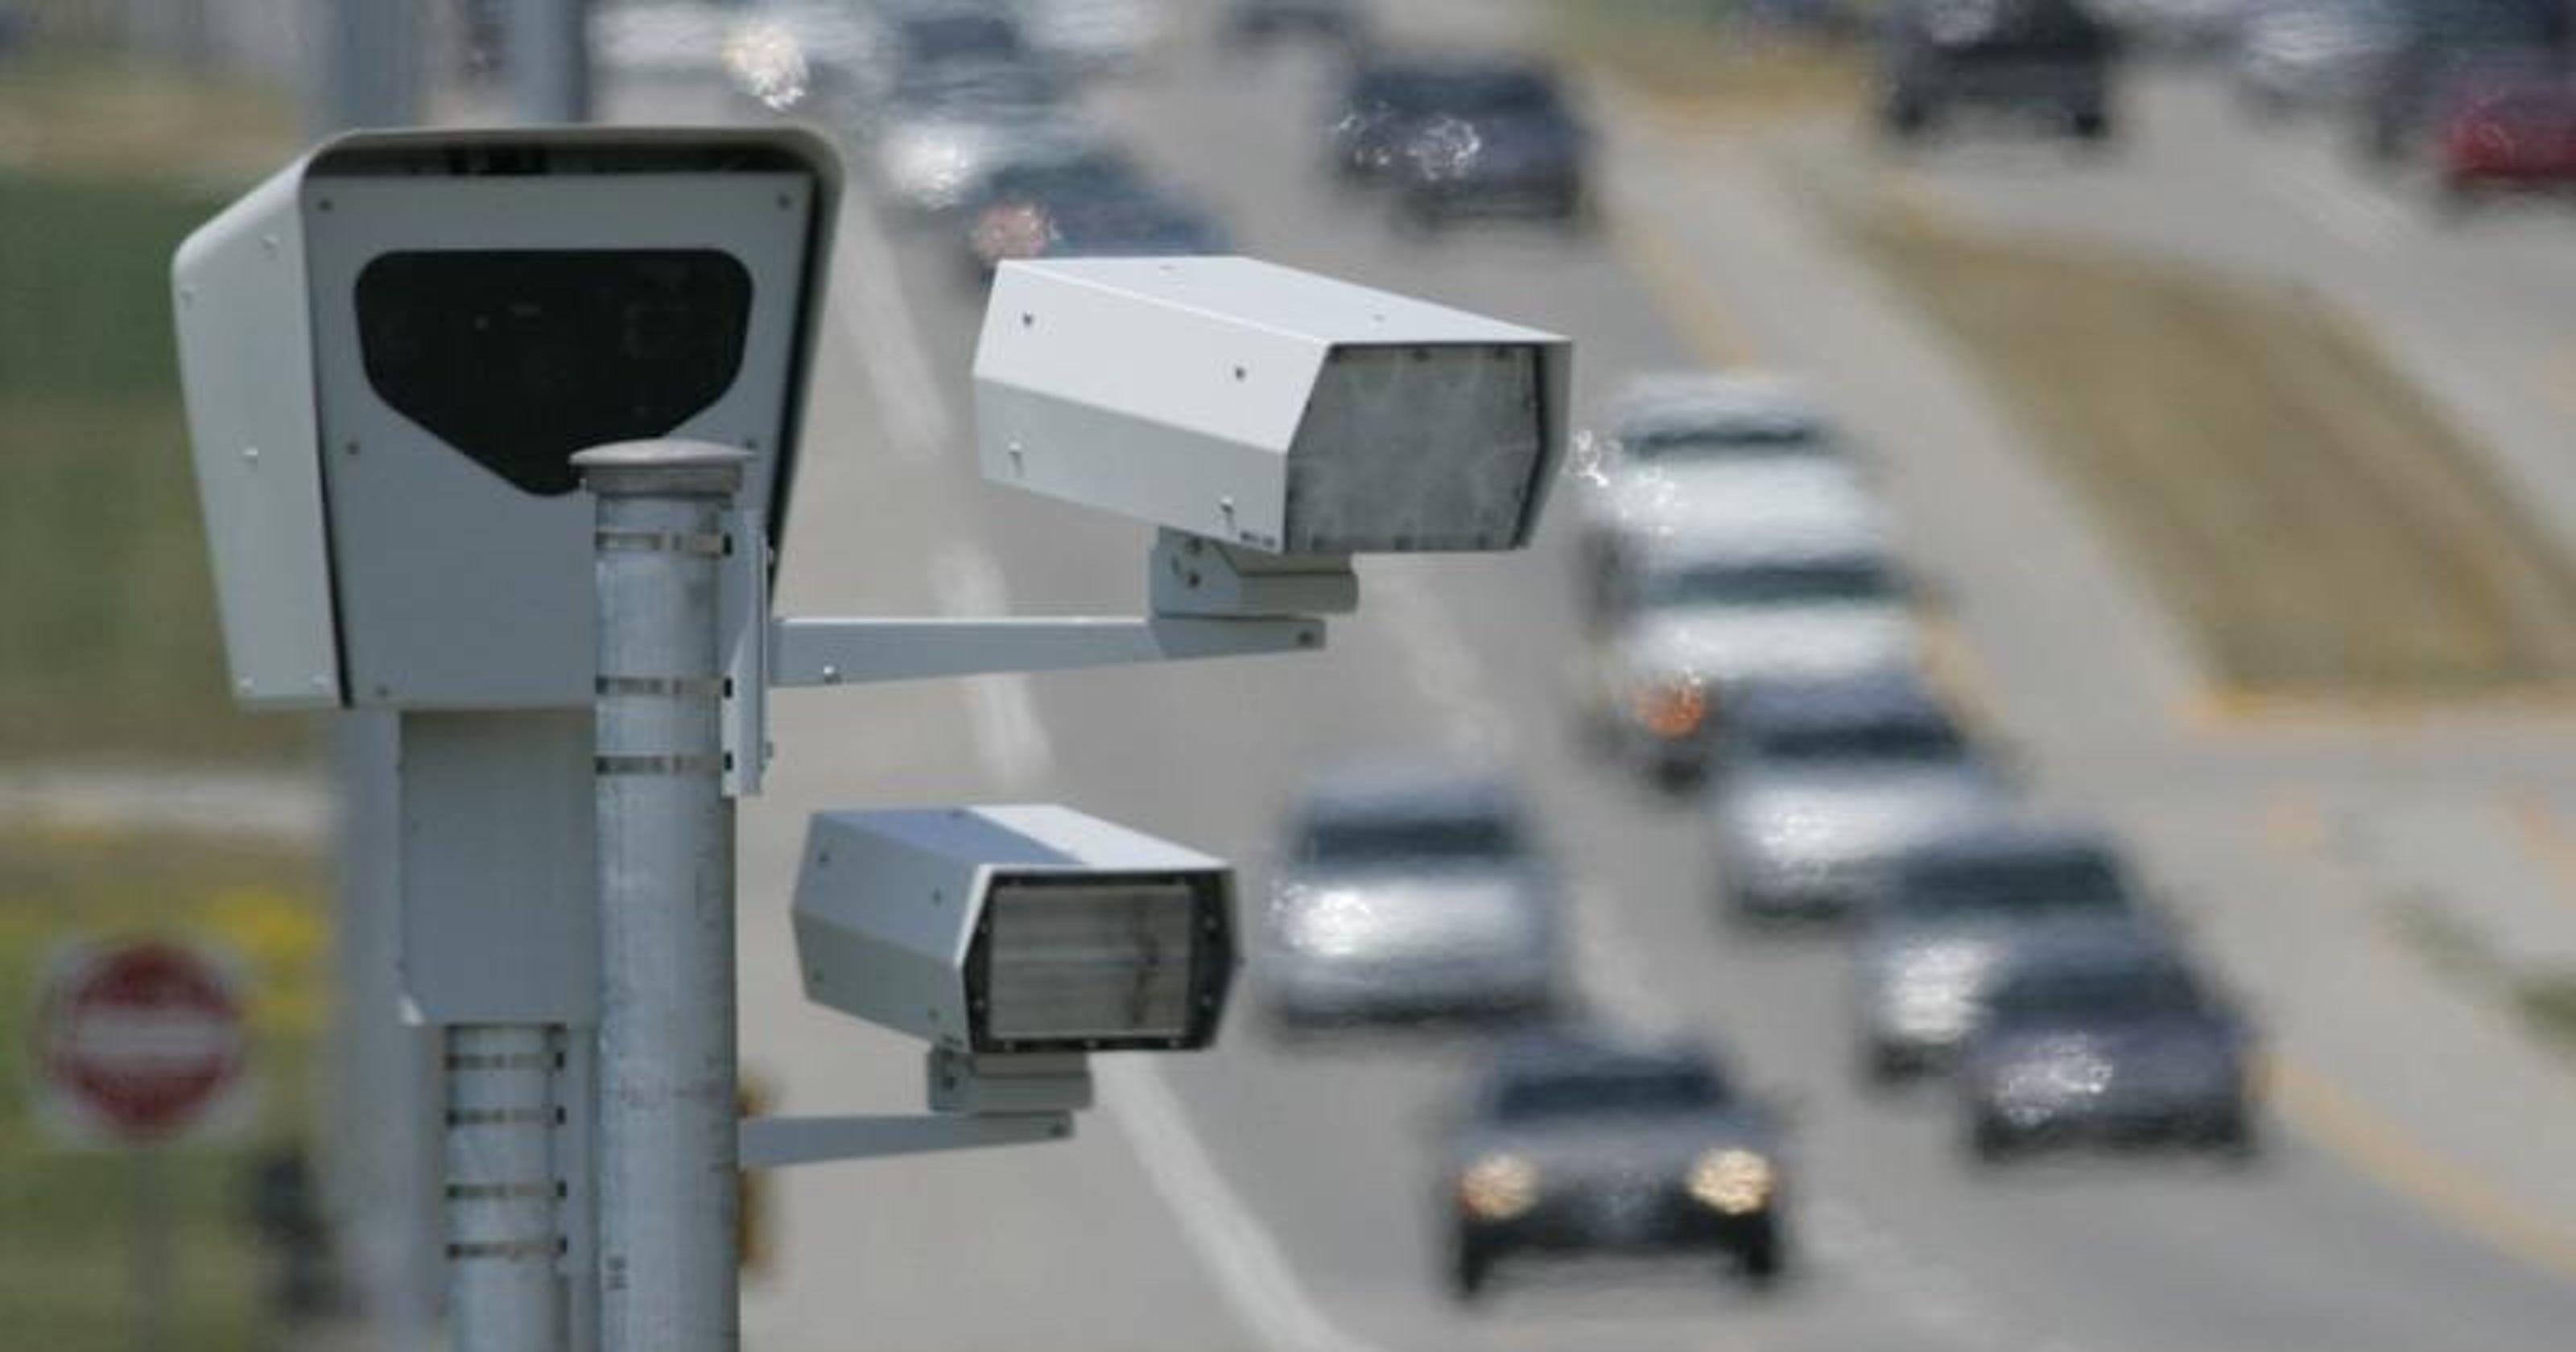 Editorial: Traffic camera scandal raises abuse concerns